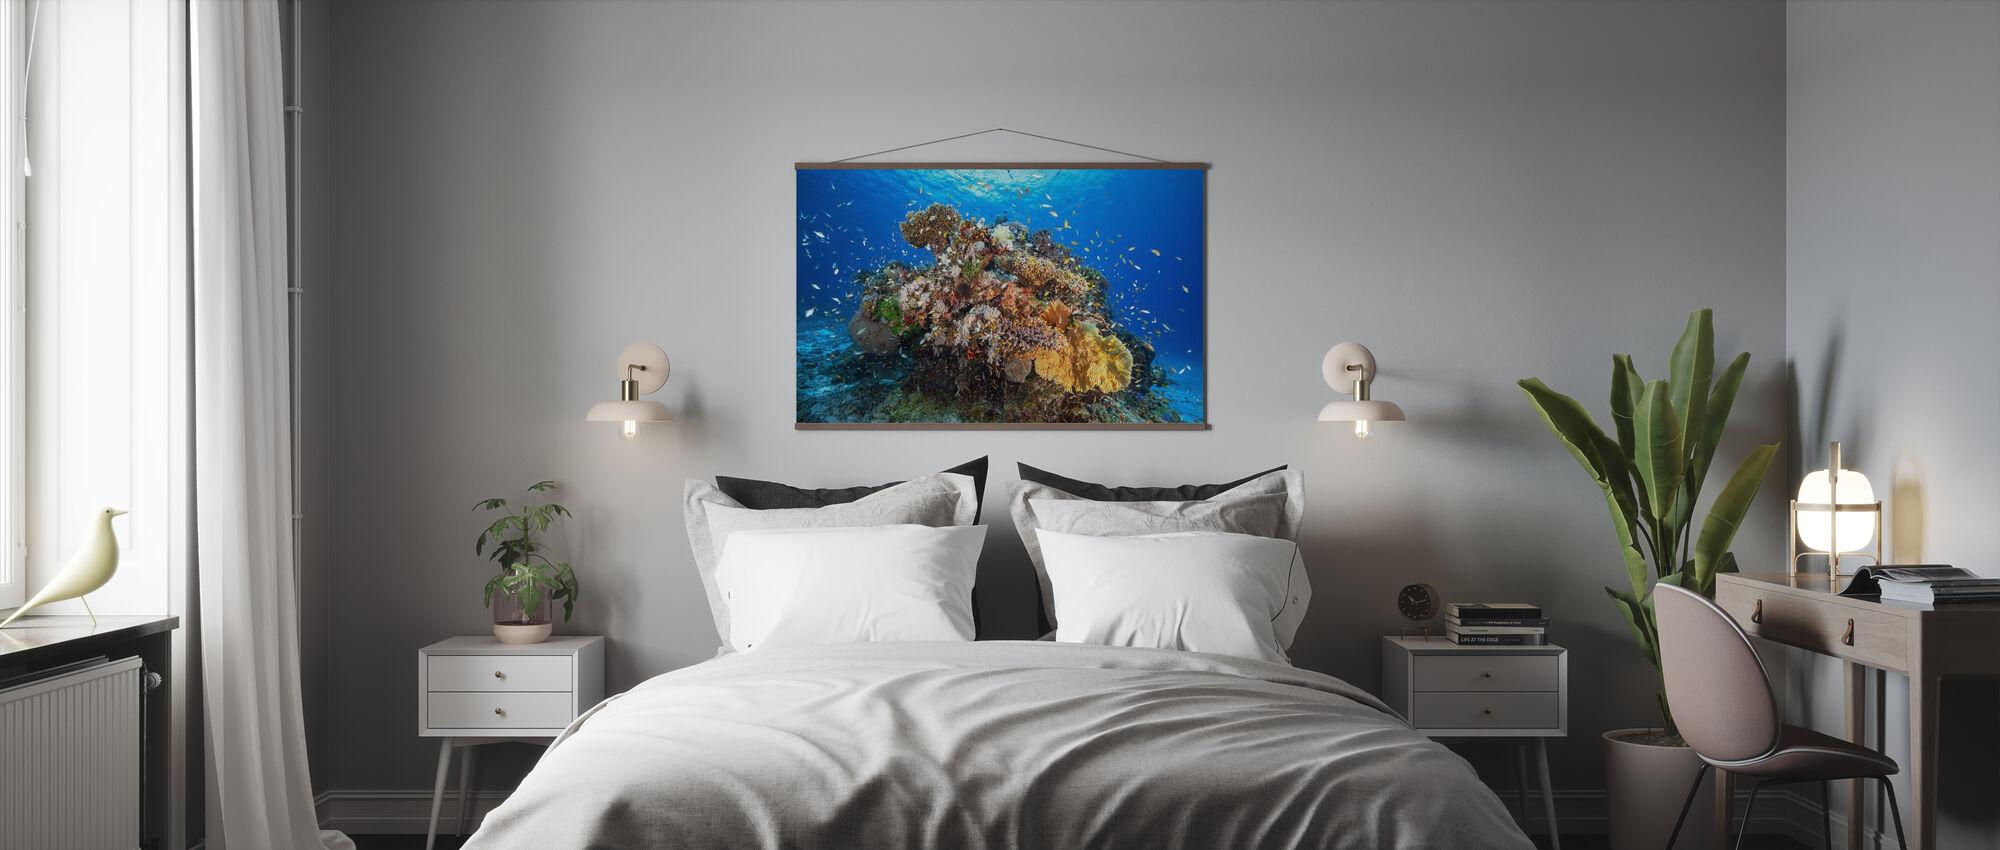 Marine Biodiversity - Poster - Bedroom